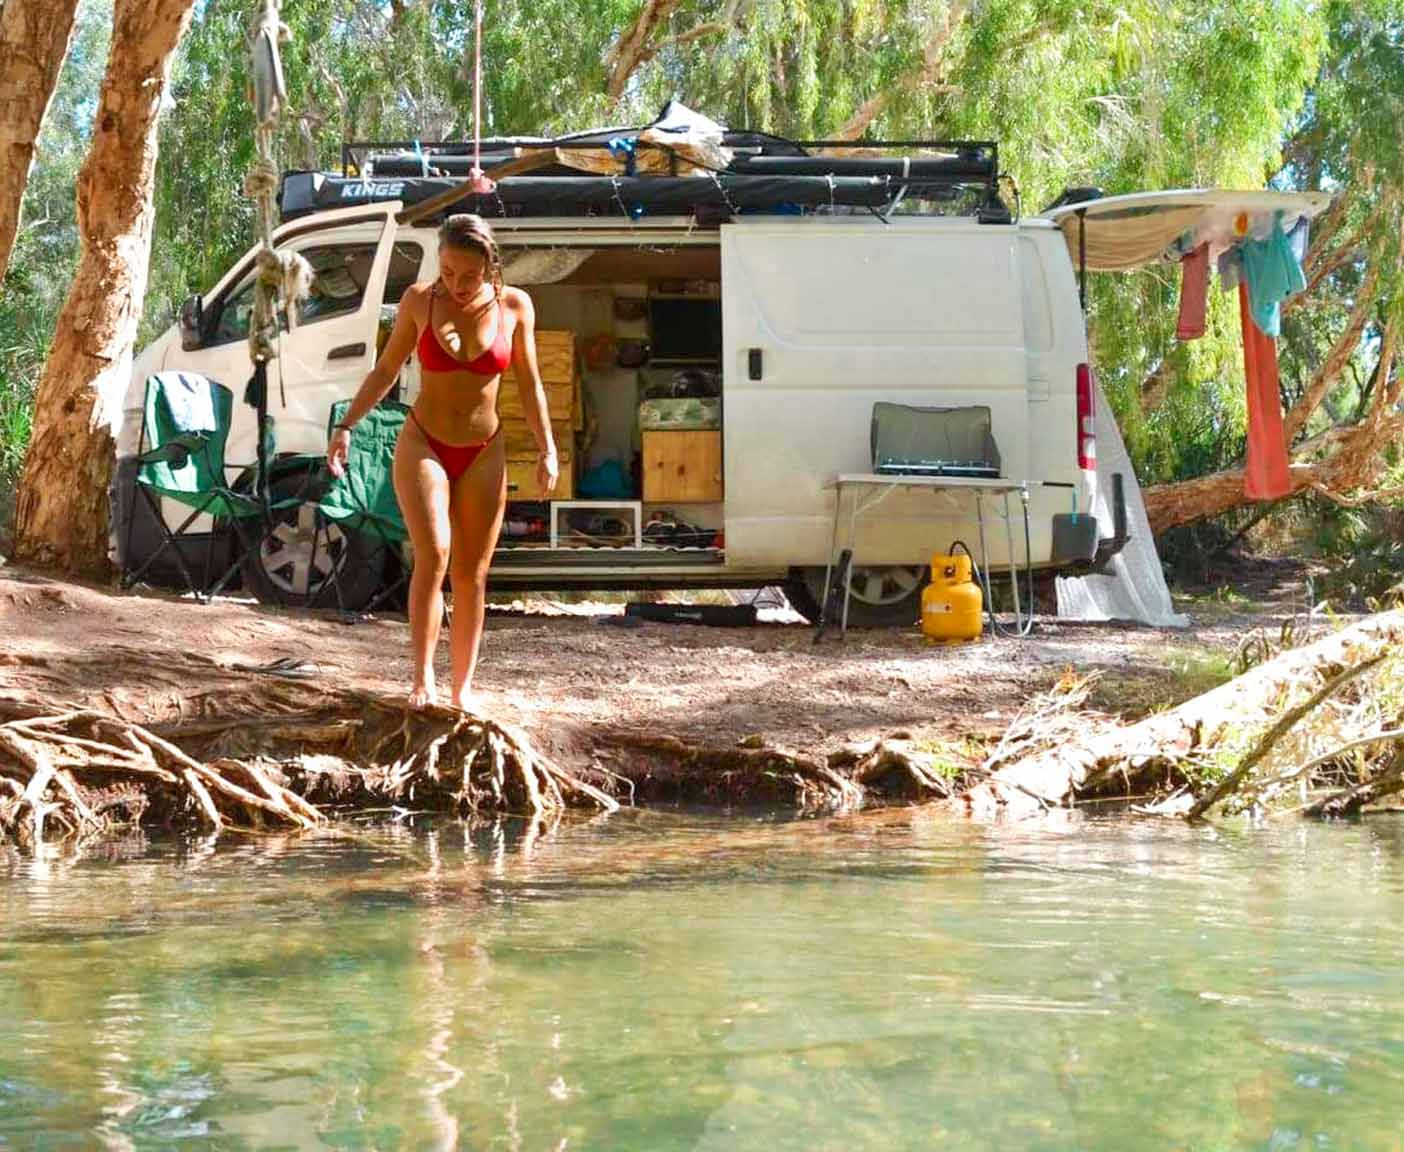 Toyota-hiace-camper-4x4-van-camping-frei-stehen-hochdach